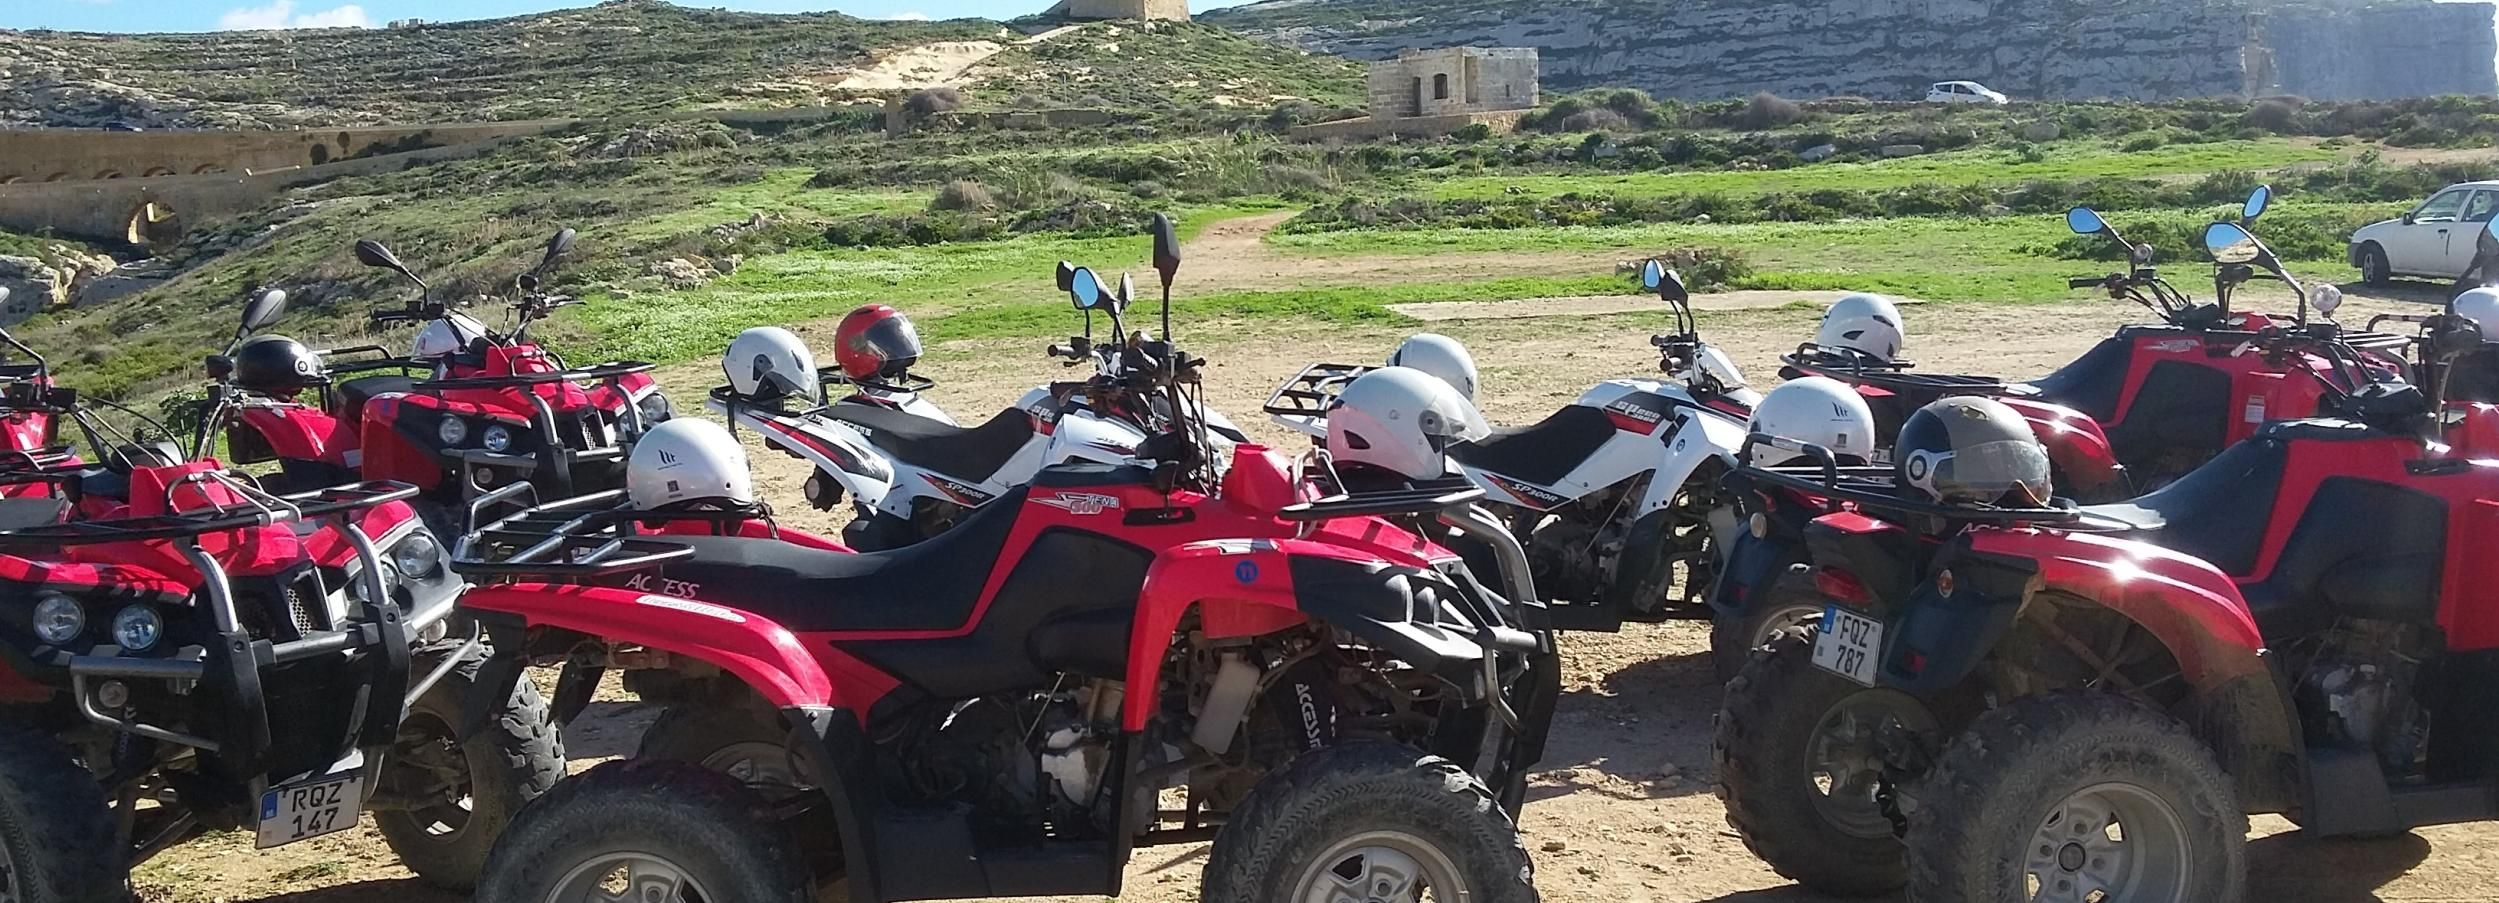 Half Day Quad Tour in Gozo